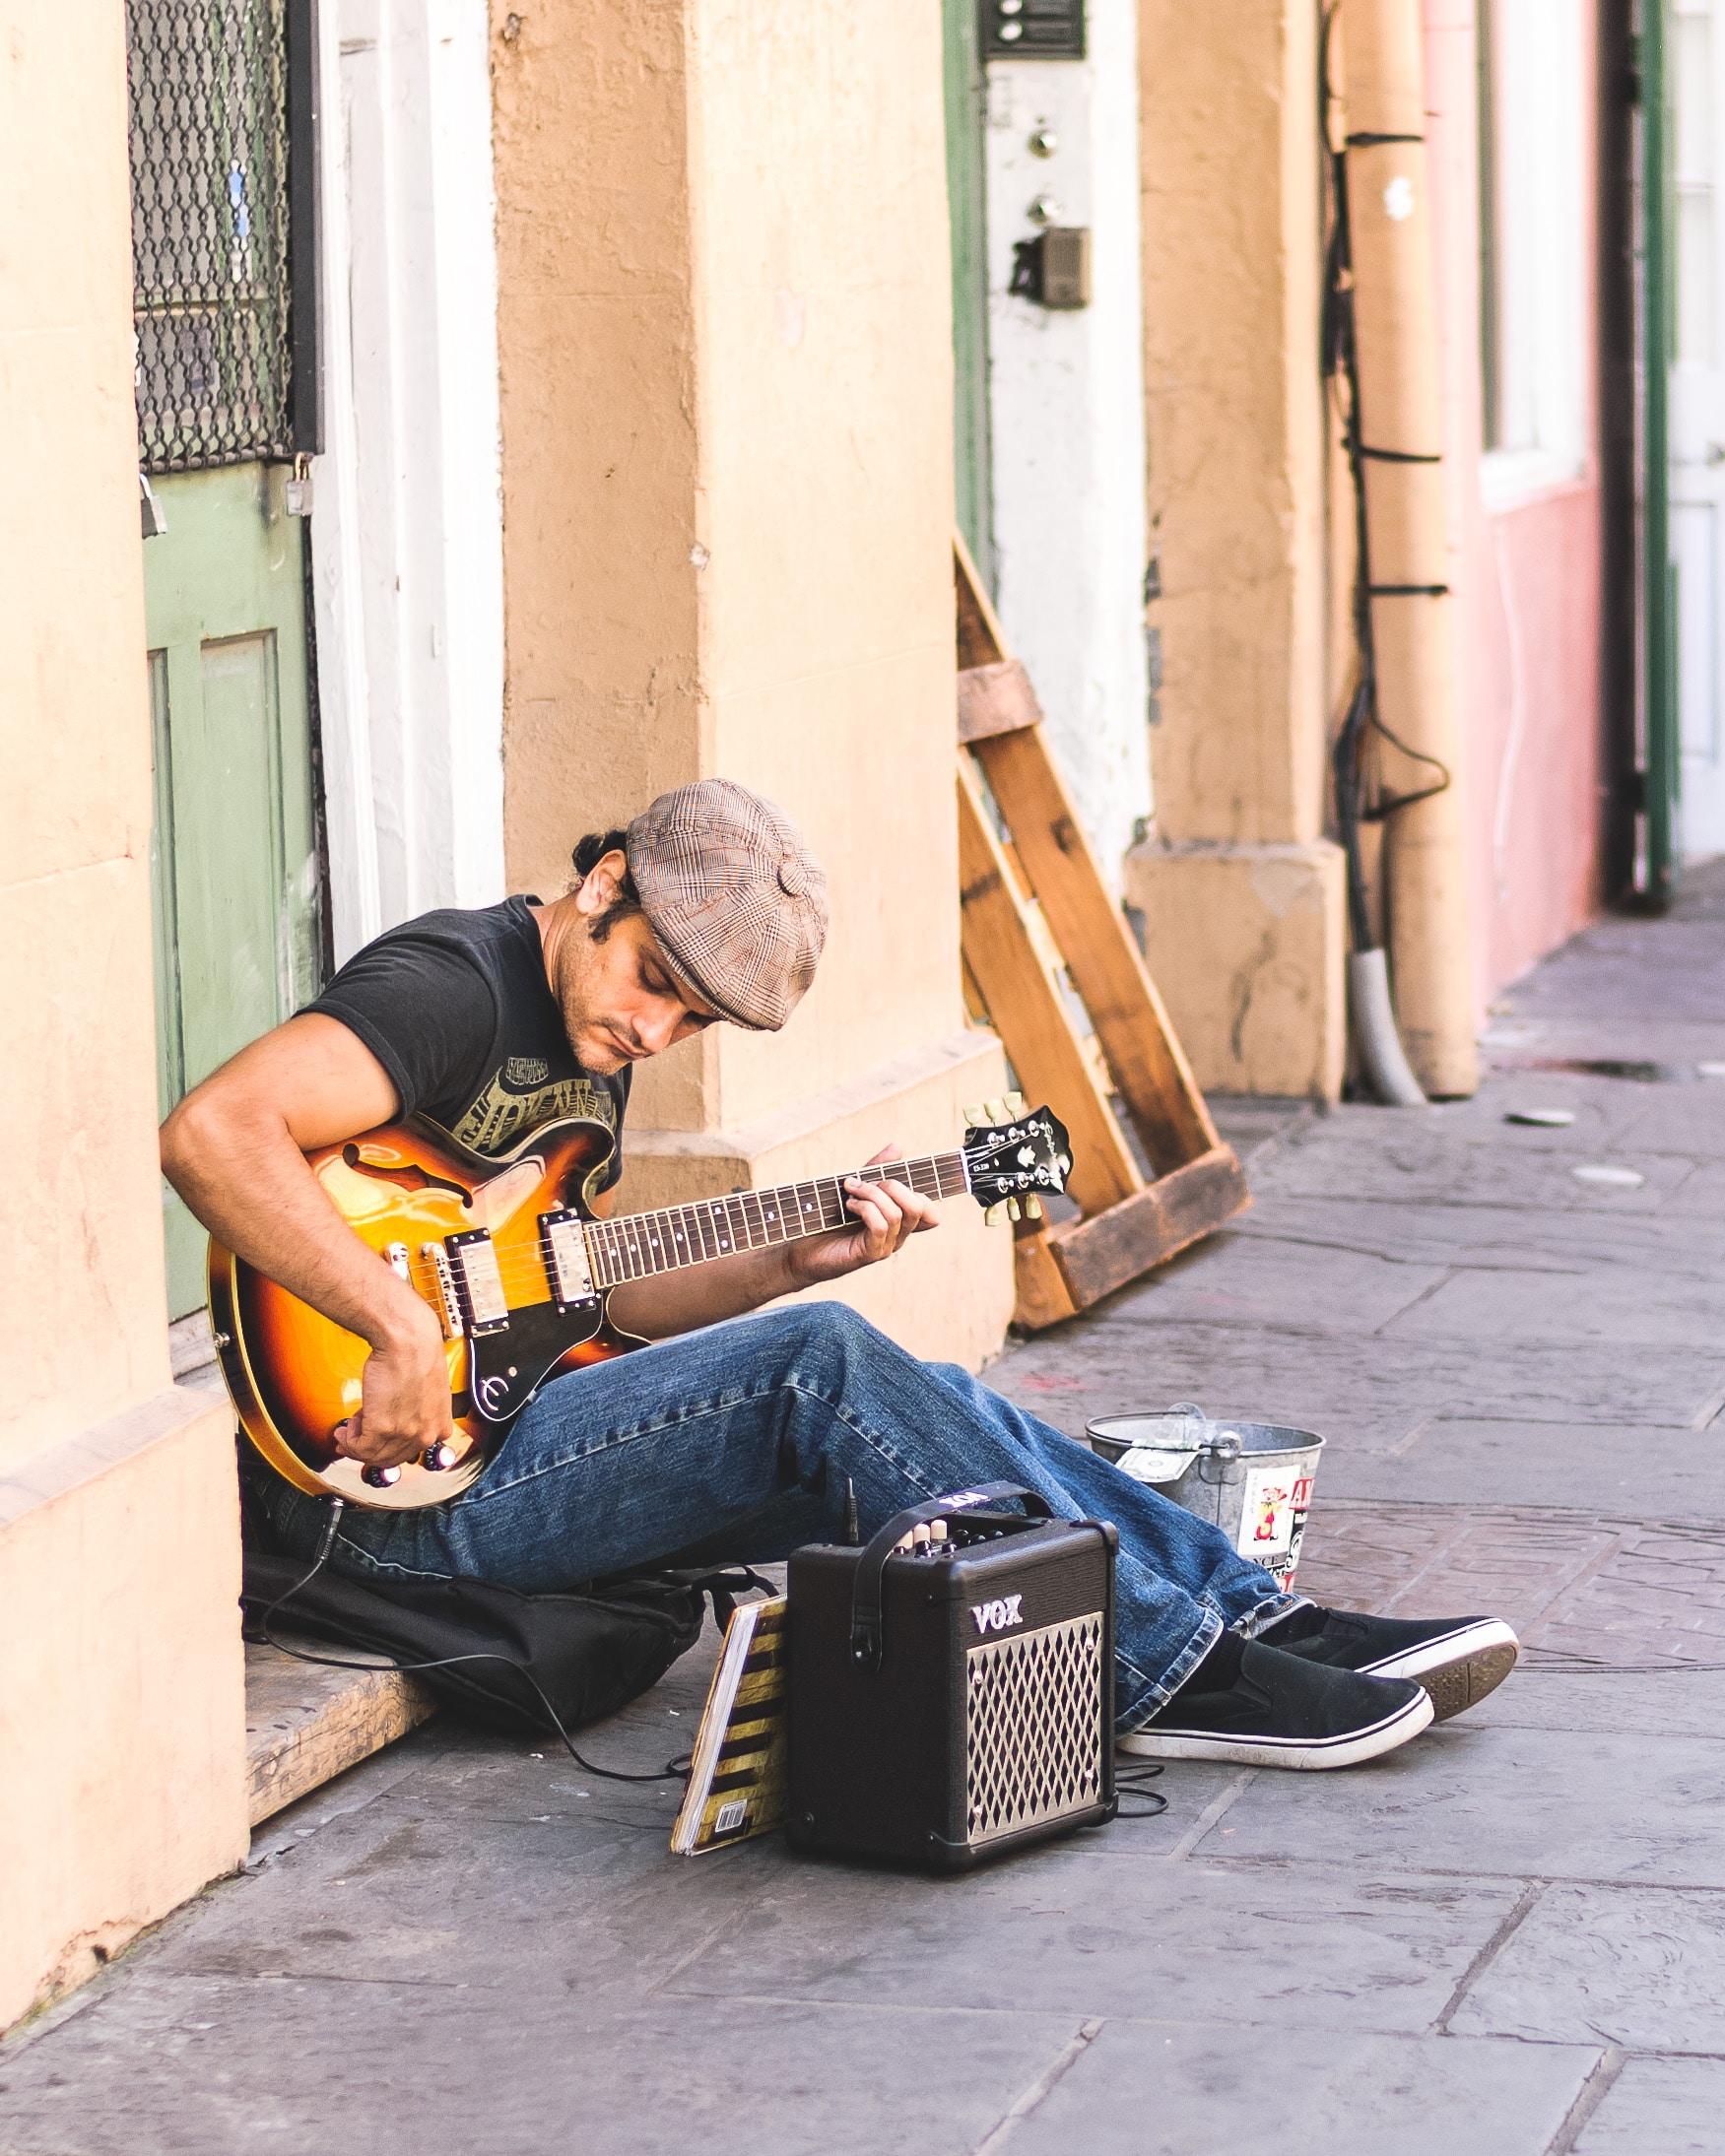 photo of man playing electric guitar